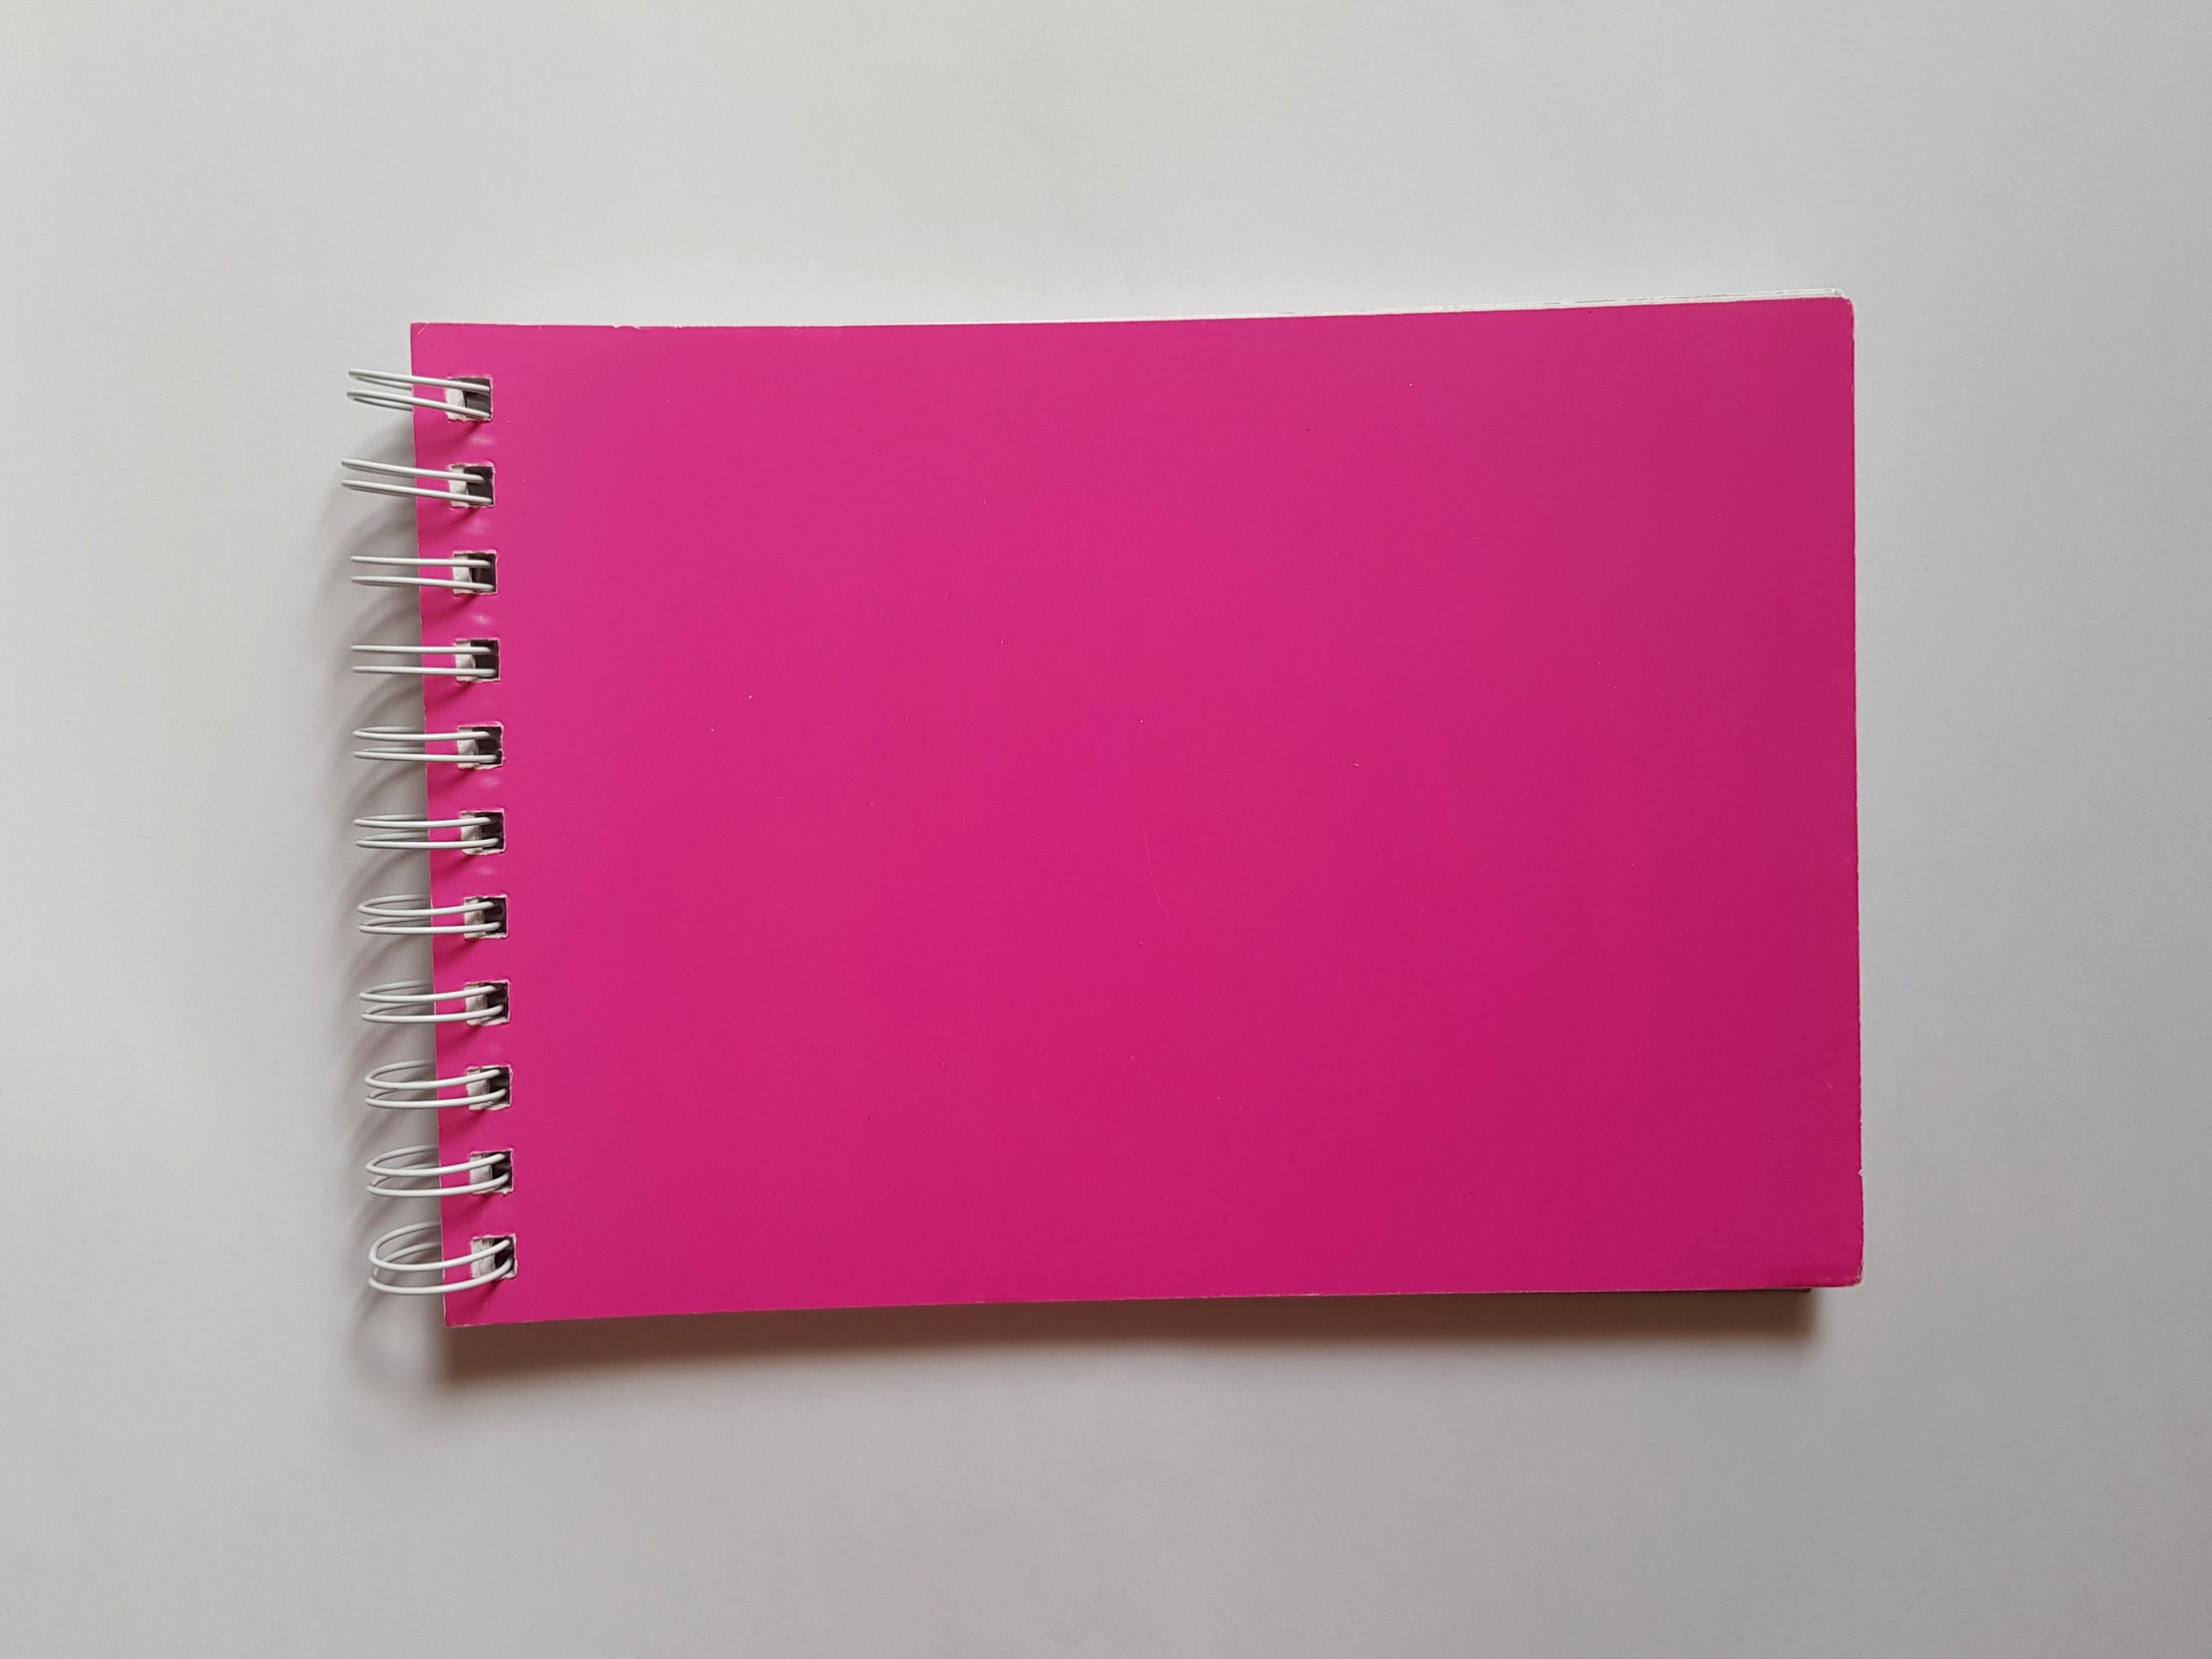 A5 Pink Sketchpad/Visual Dairy